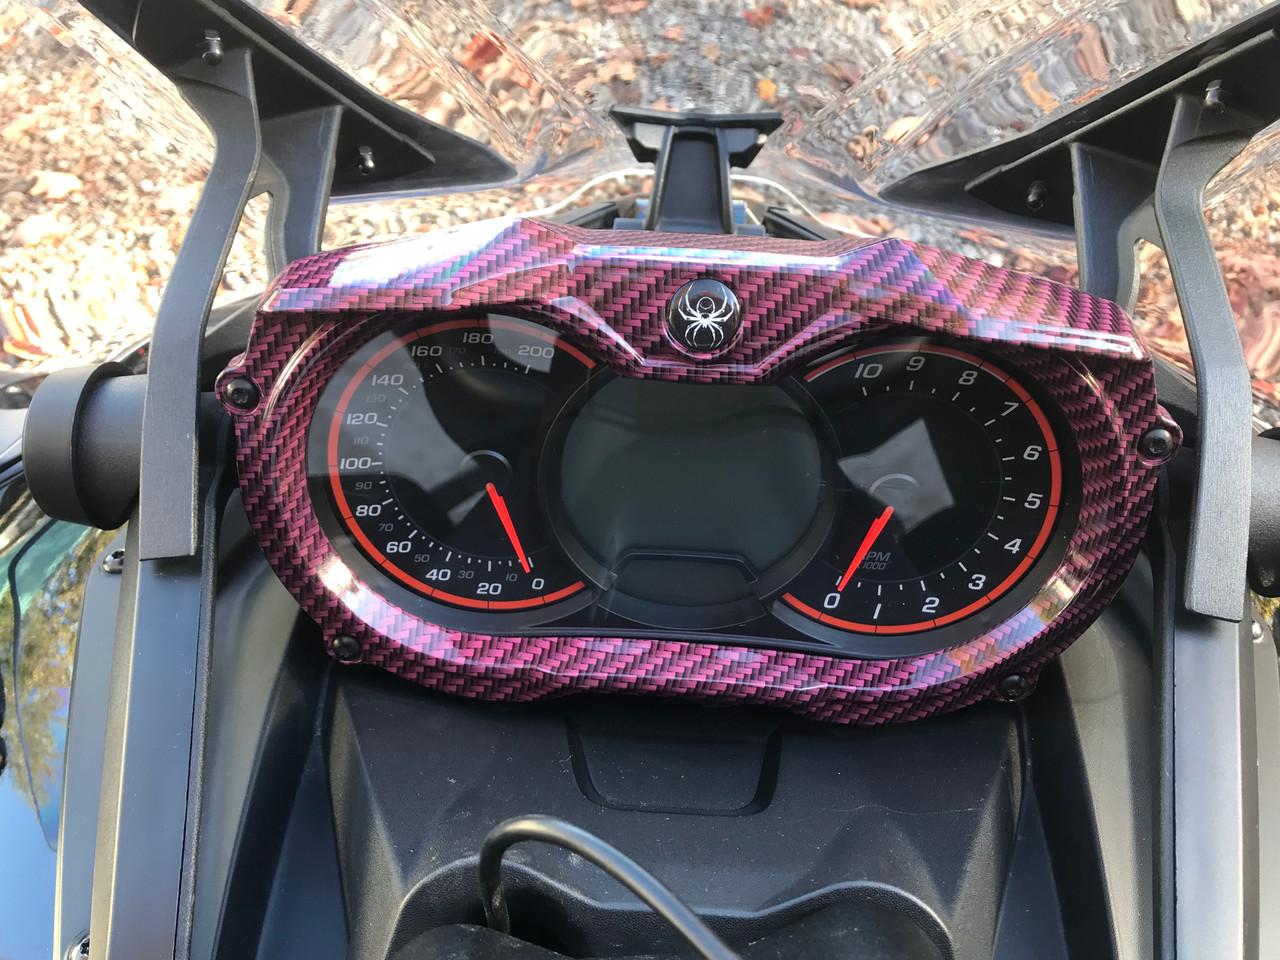 F3/F3s and F3 Daytona Series Pink Carbon Fibre 2015-18 (2 pieces)